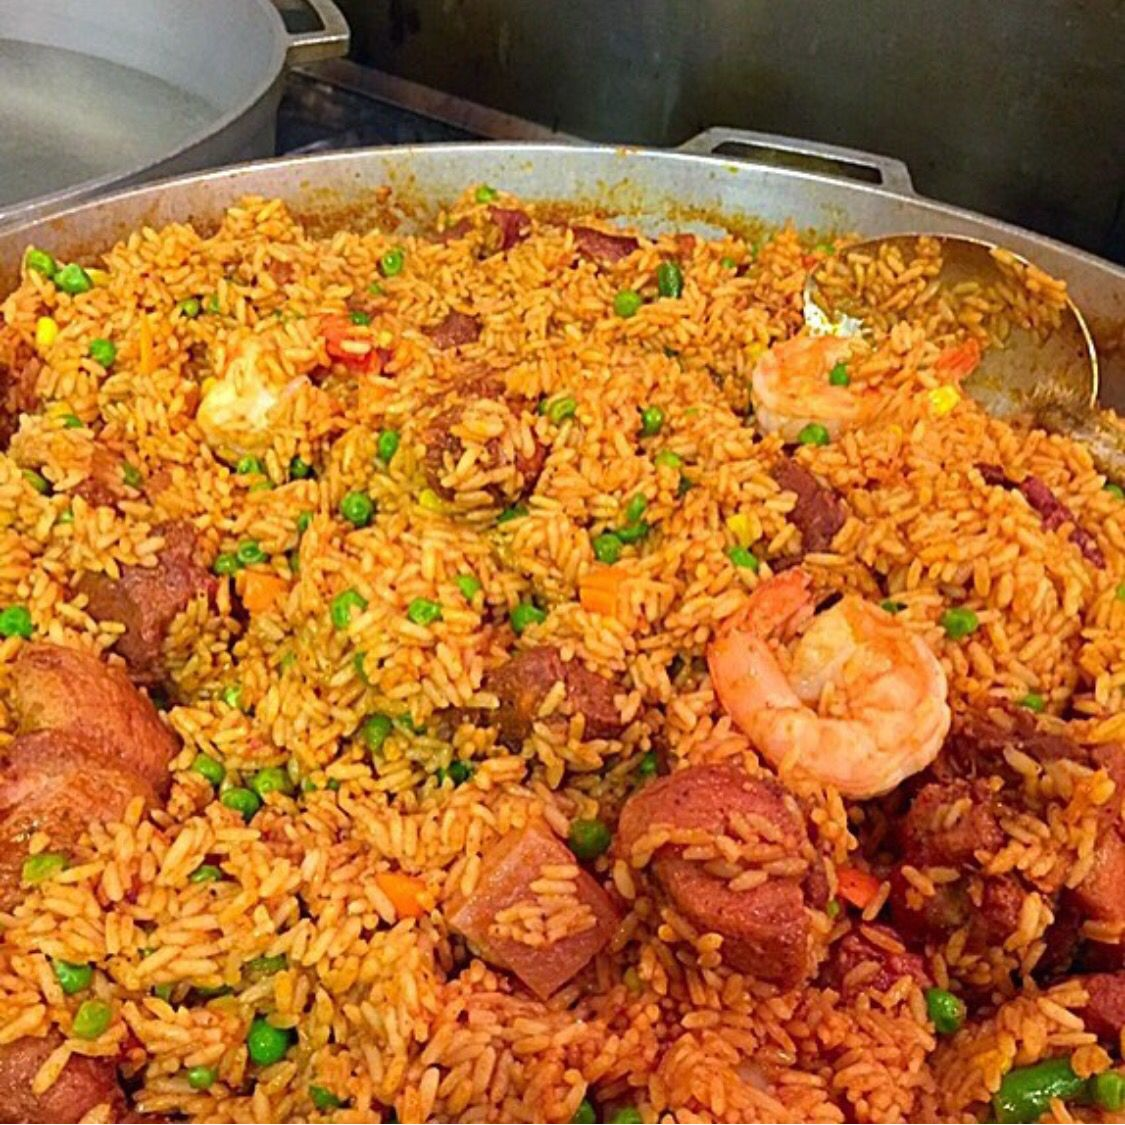 The real original jollof rice by lib food african food pinterest the real original jollof rice by lib food forumfinder Image collections